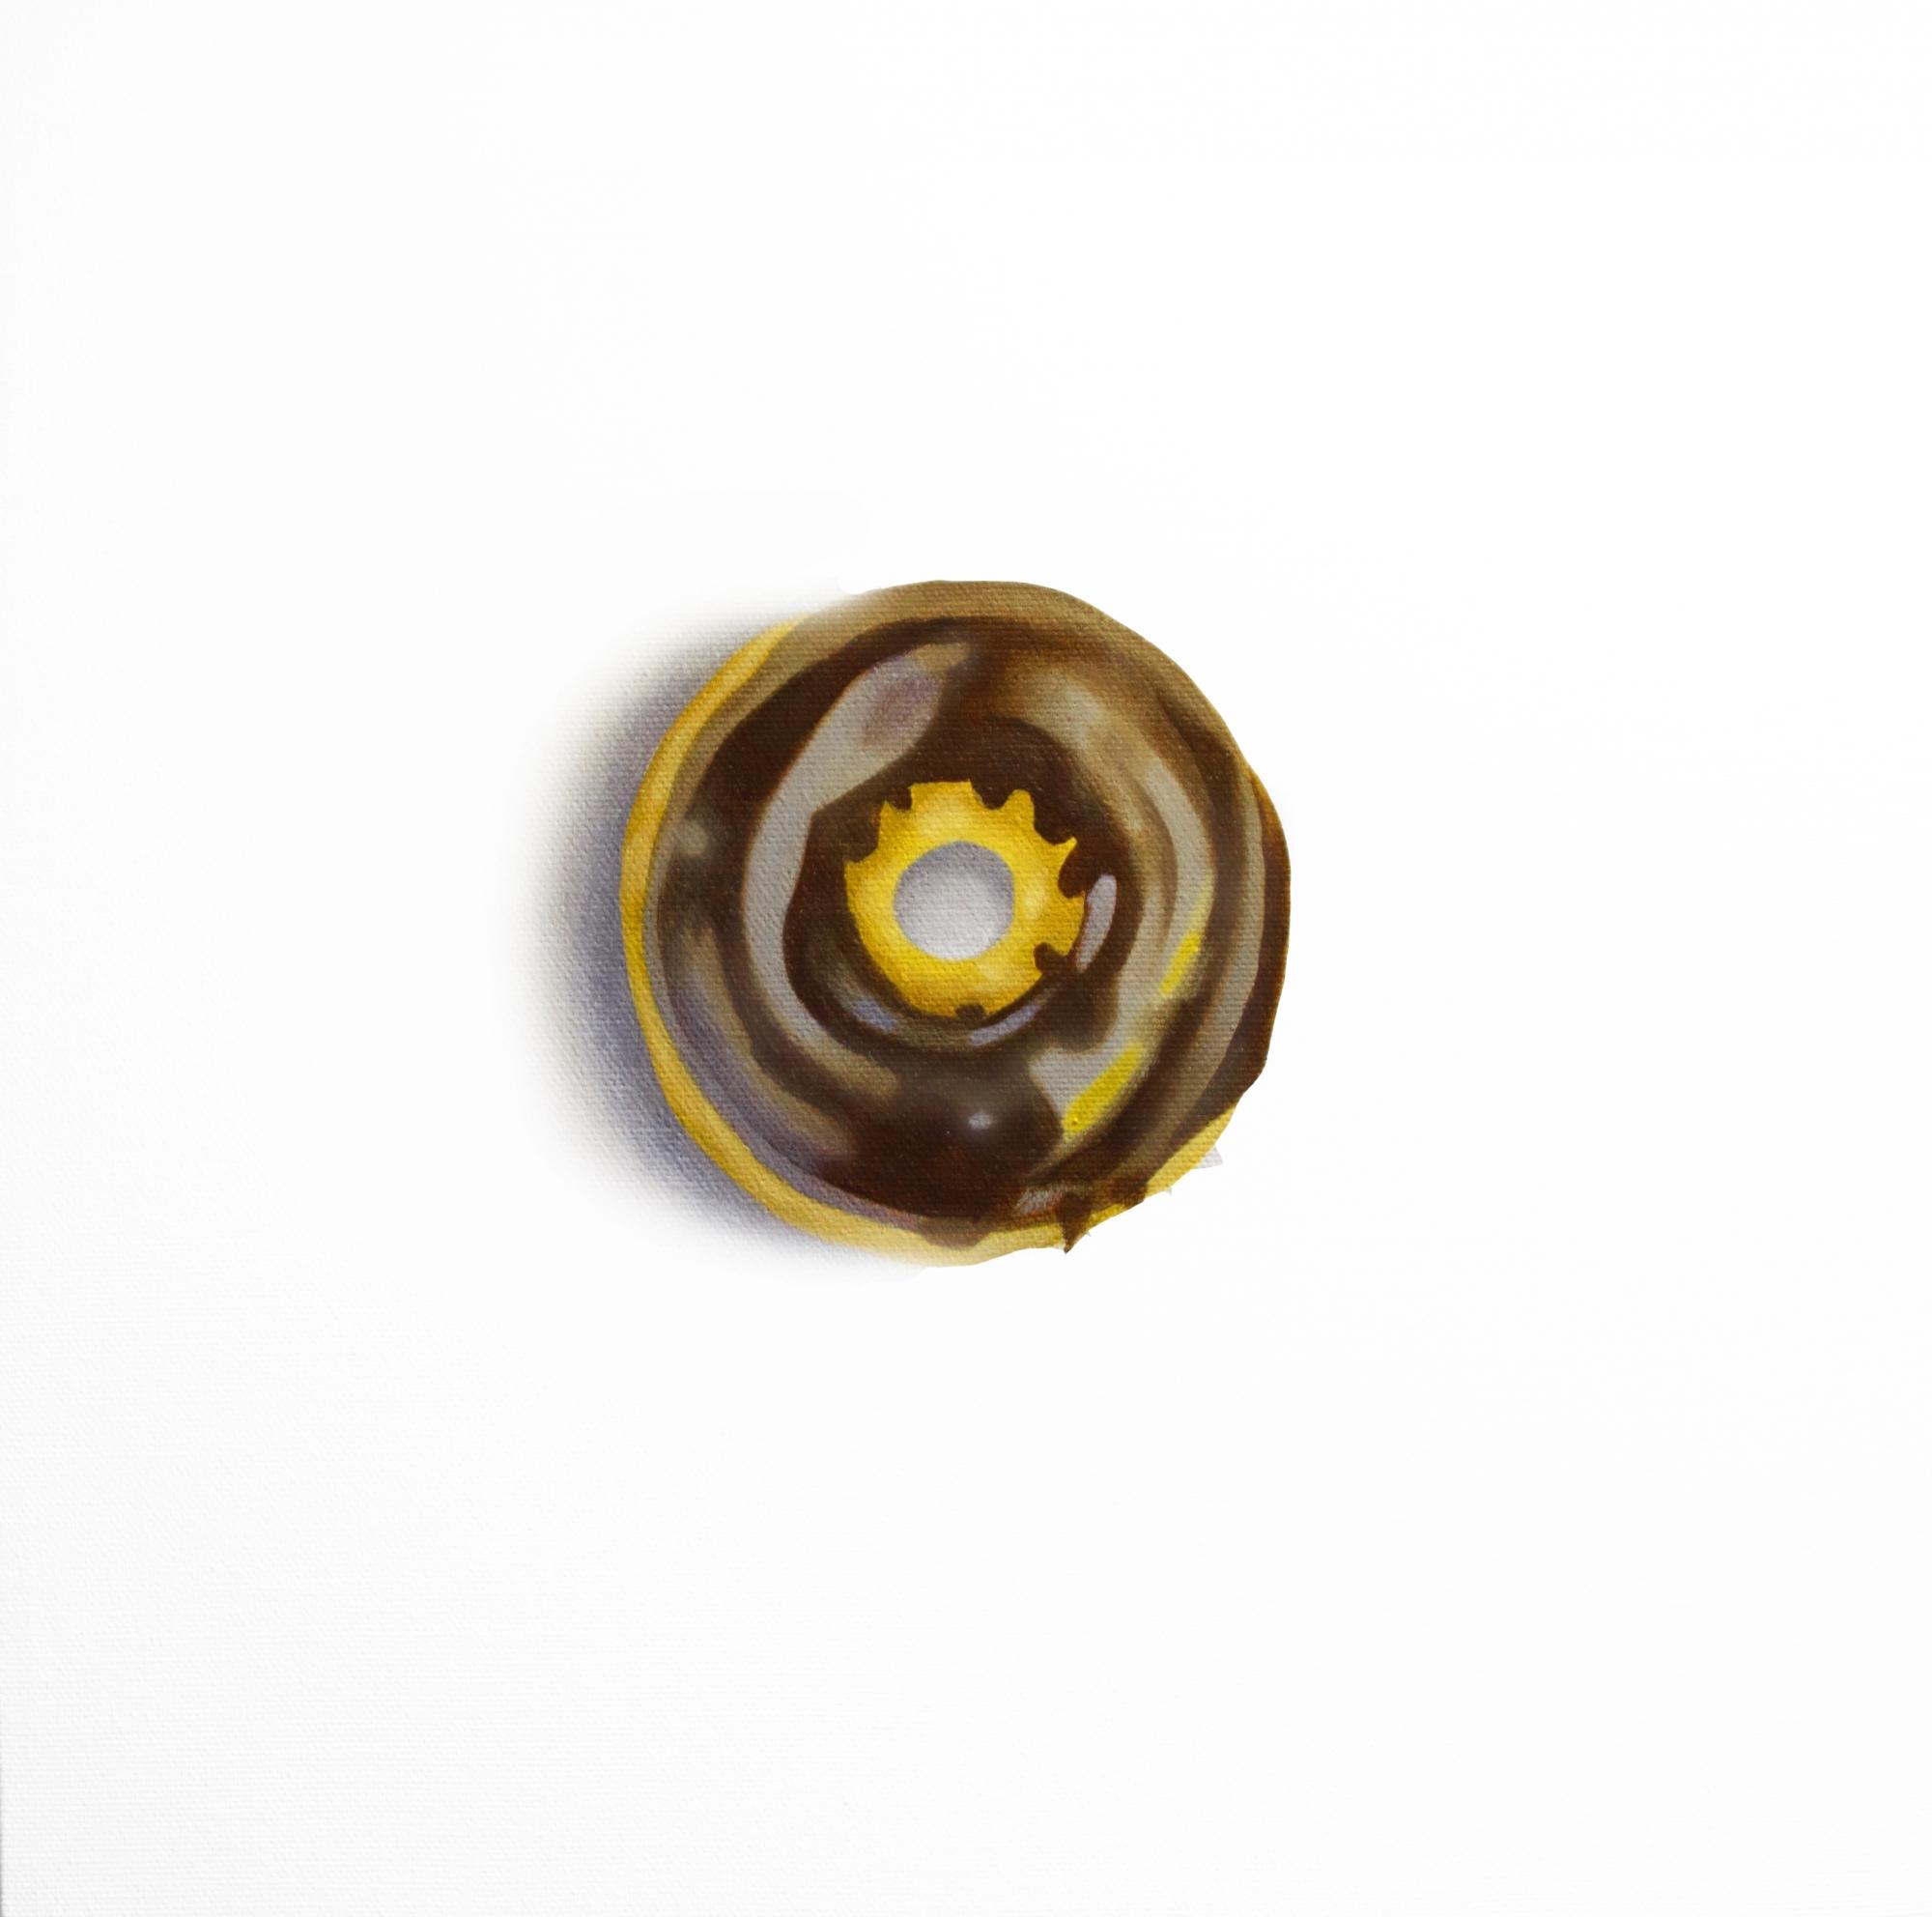 Tasting Room - Chocolate Donut  by Erin Rothstein